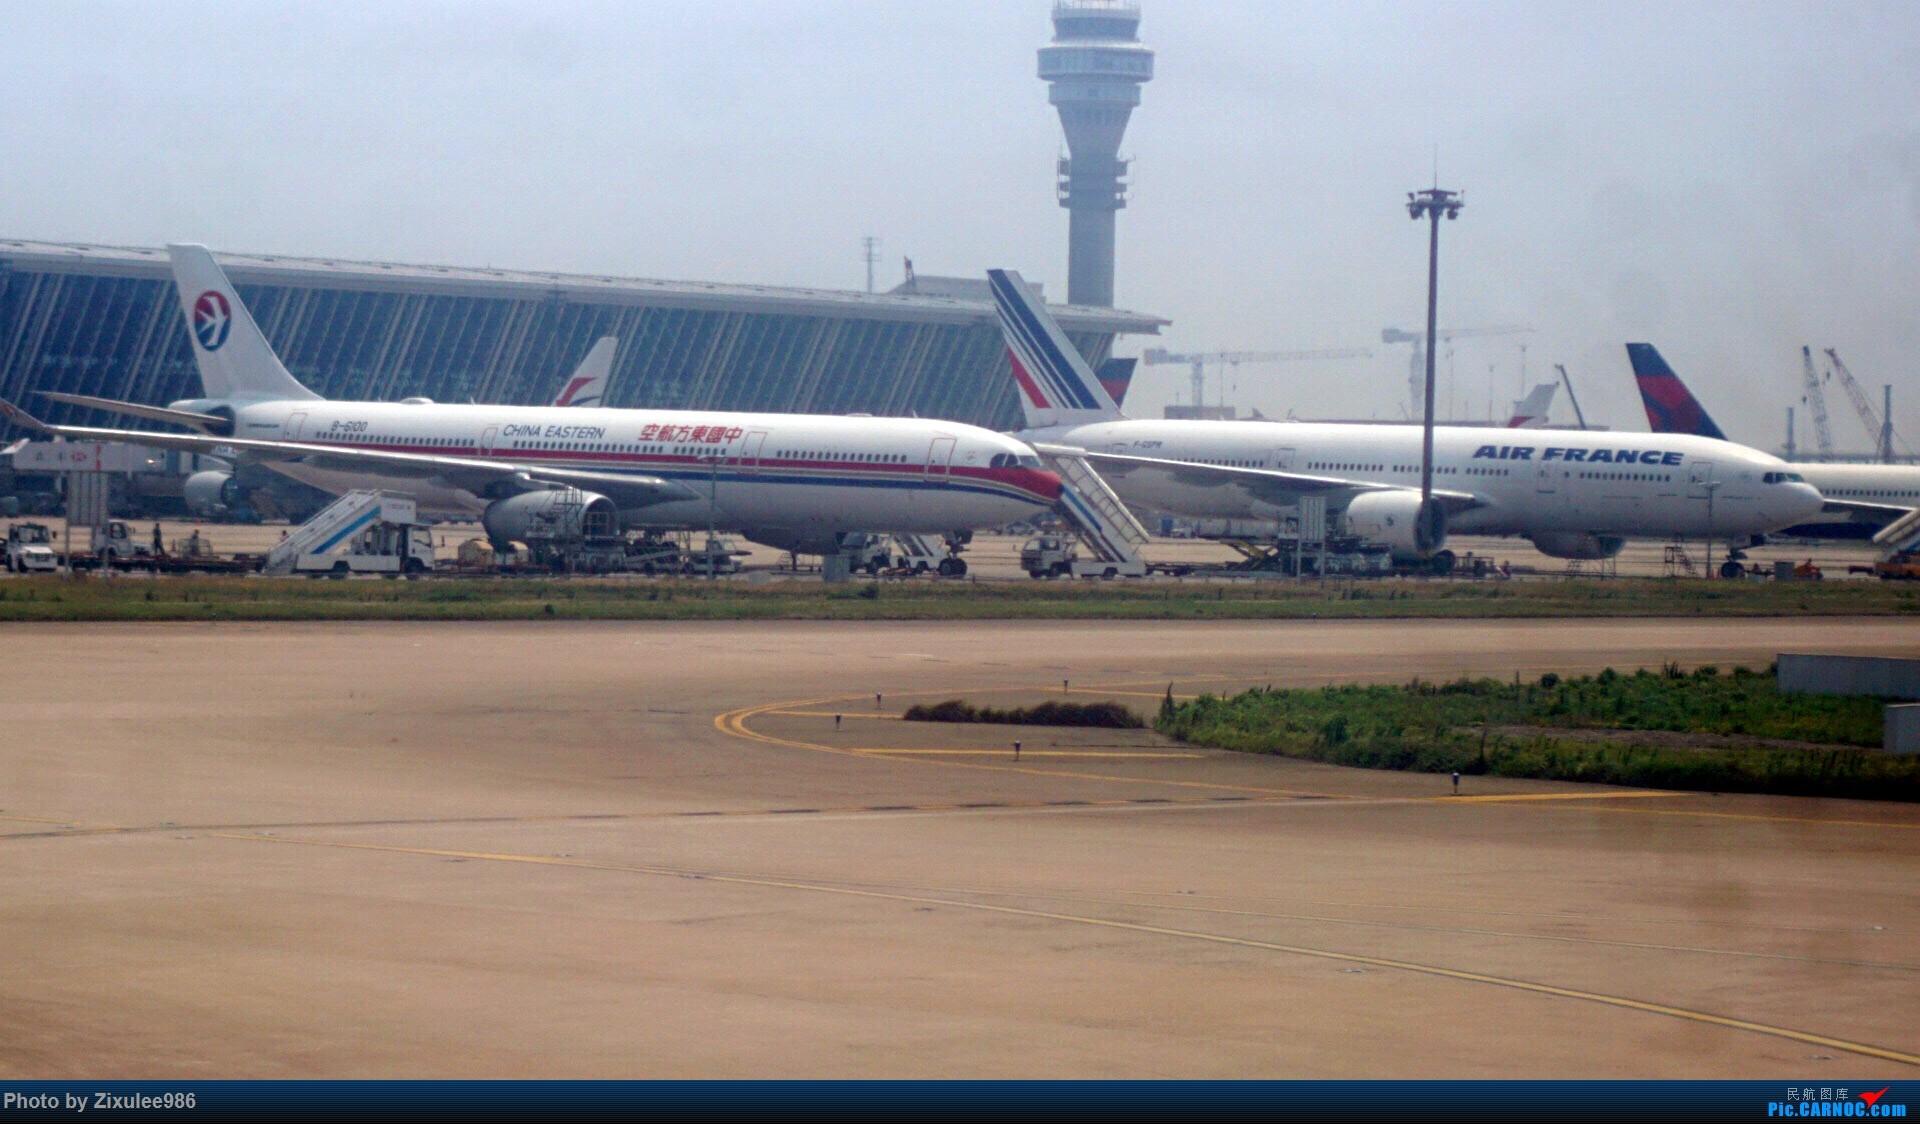 Re:[原创]加拿大21日游学之旅(一)~JJN-PVG-YYZ..(内含flightlog)~第一次发游记~多图缓更请谅解 AIRBUS A330-300 B-6100 中国上海浦东国际机场